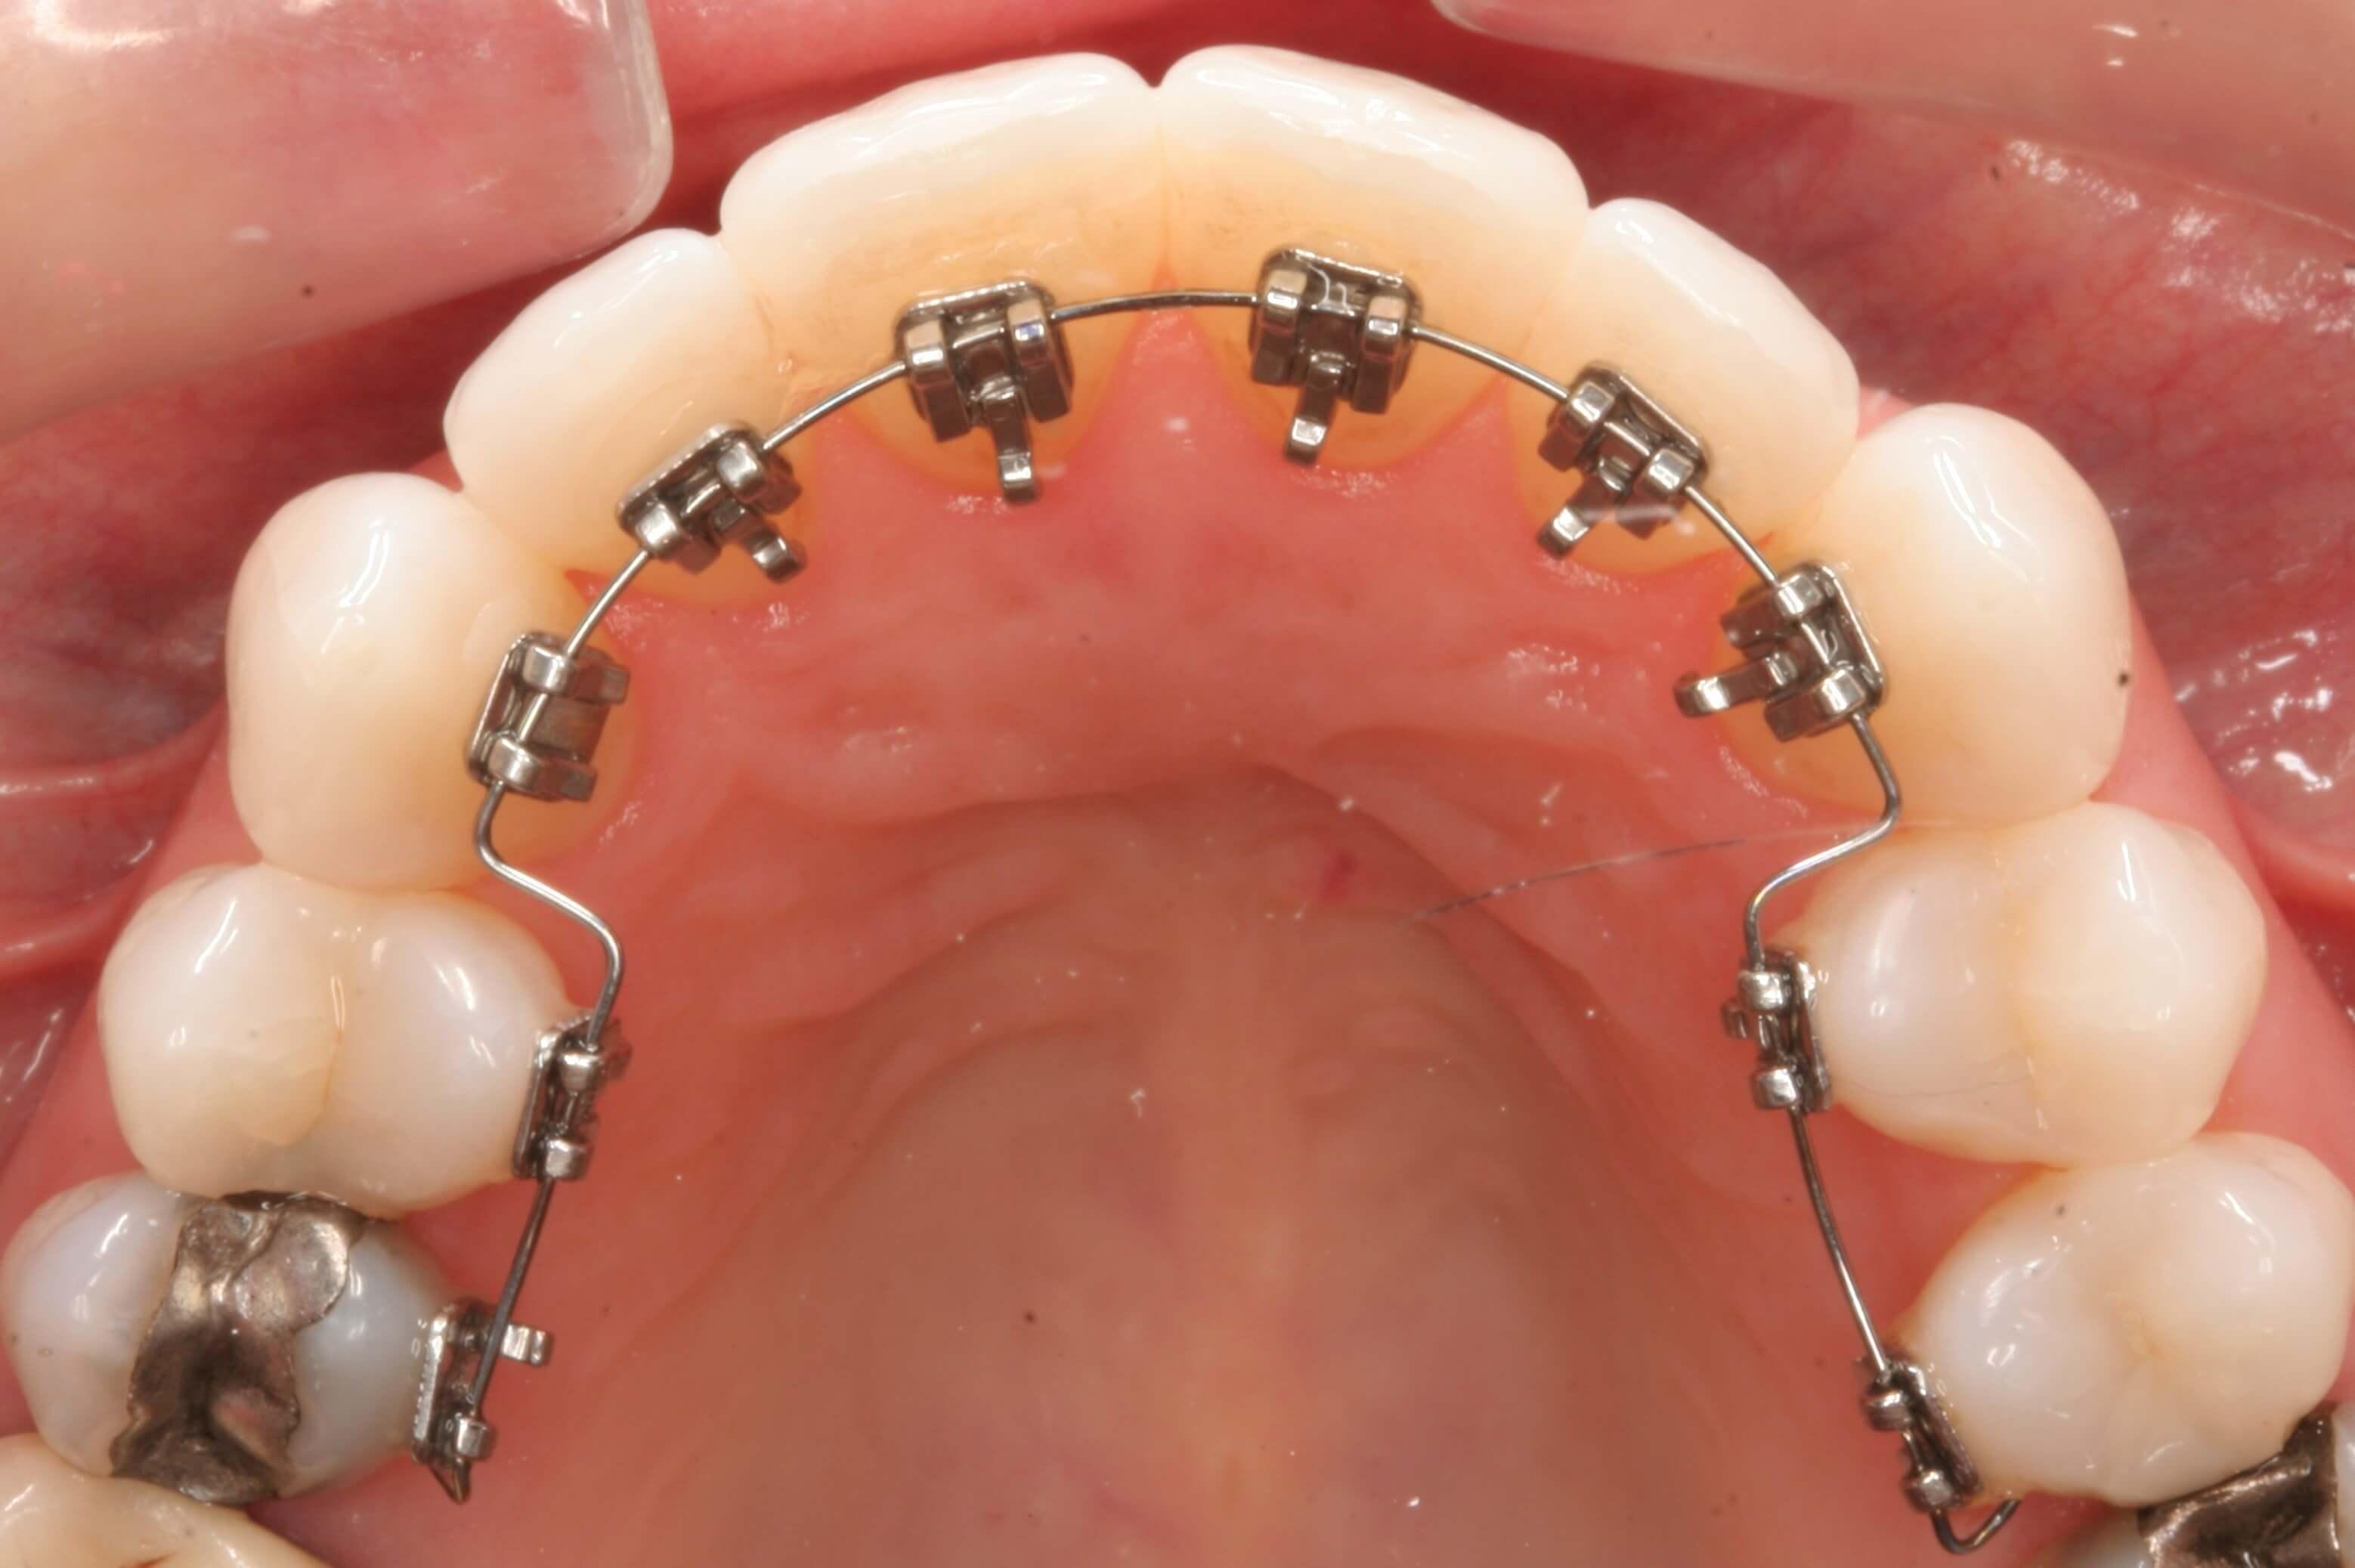 کلینیک دندانپزشکی آرکا - ارتودنسی نامرئی (لینگوال)